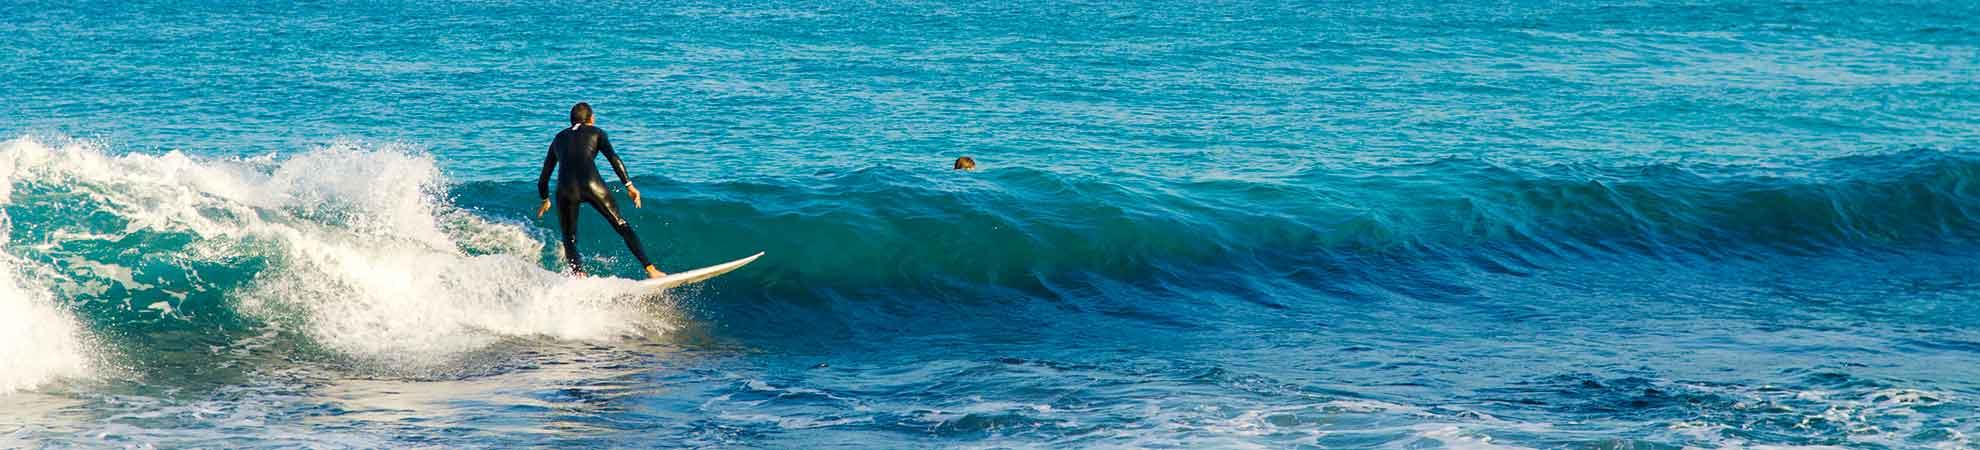 Let's go surfing à Bondi Beach !